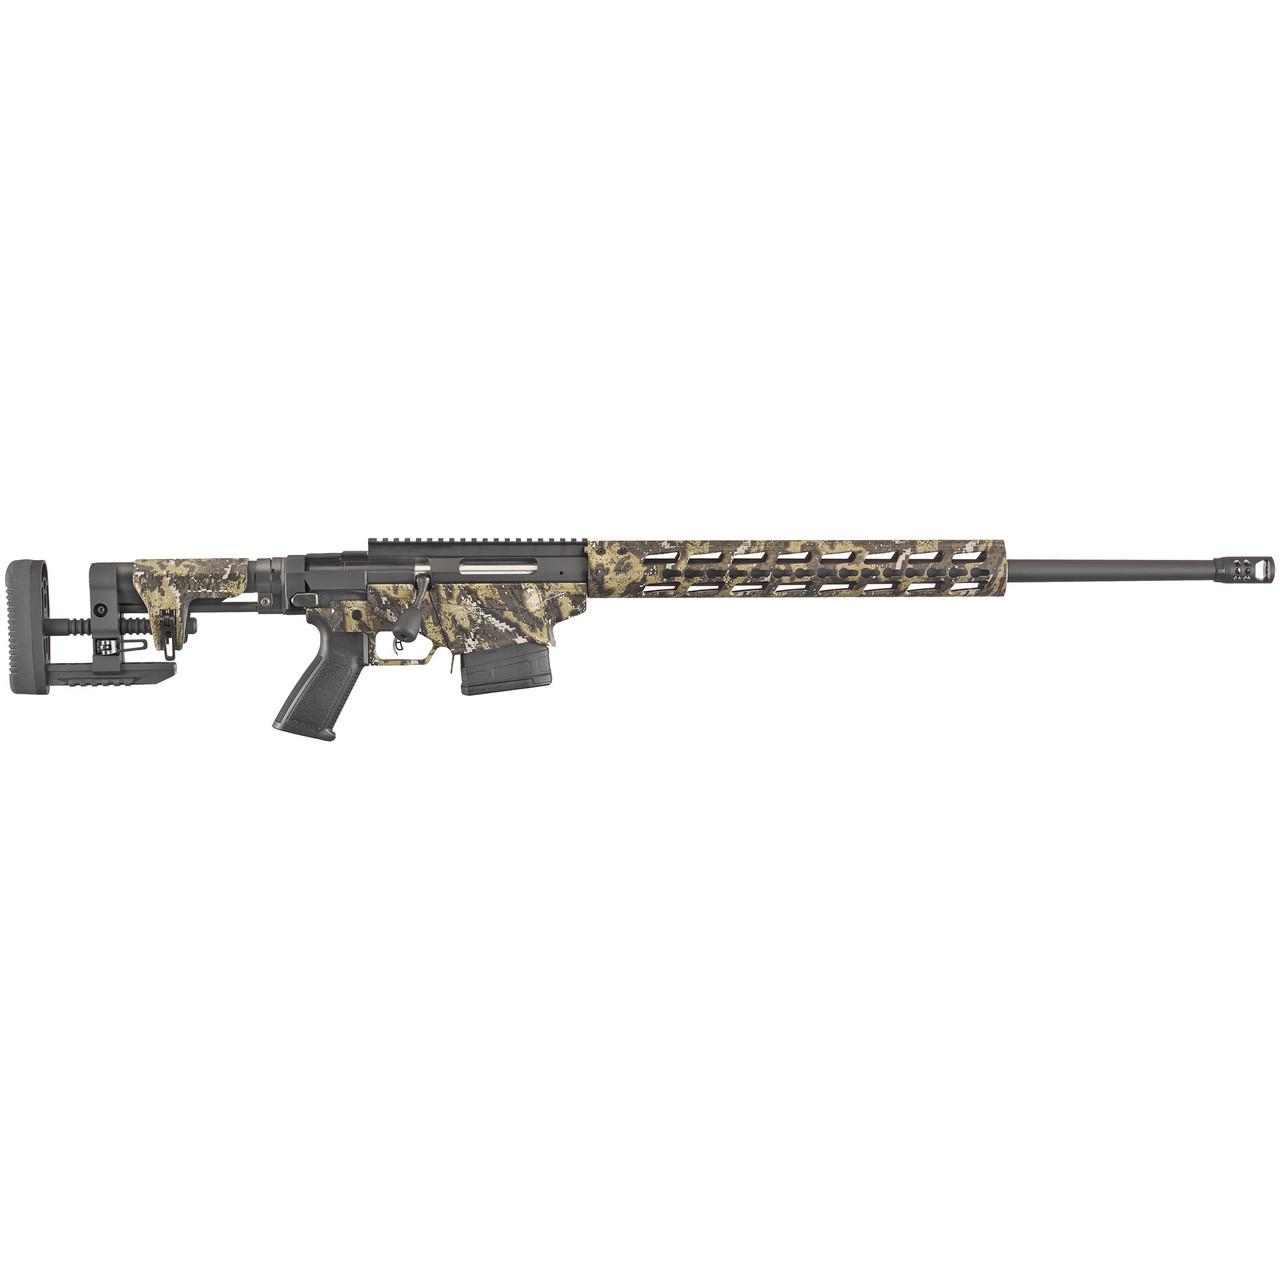 Ruger Precision Rifle Talo Edition CALIFORNIA LEGAL - 6.5 Creedmoor - Desolve Bare Camo